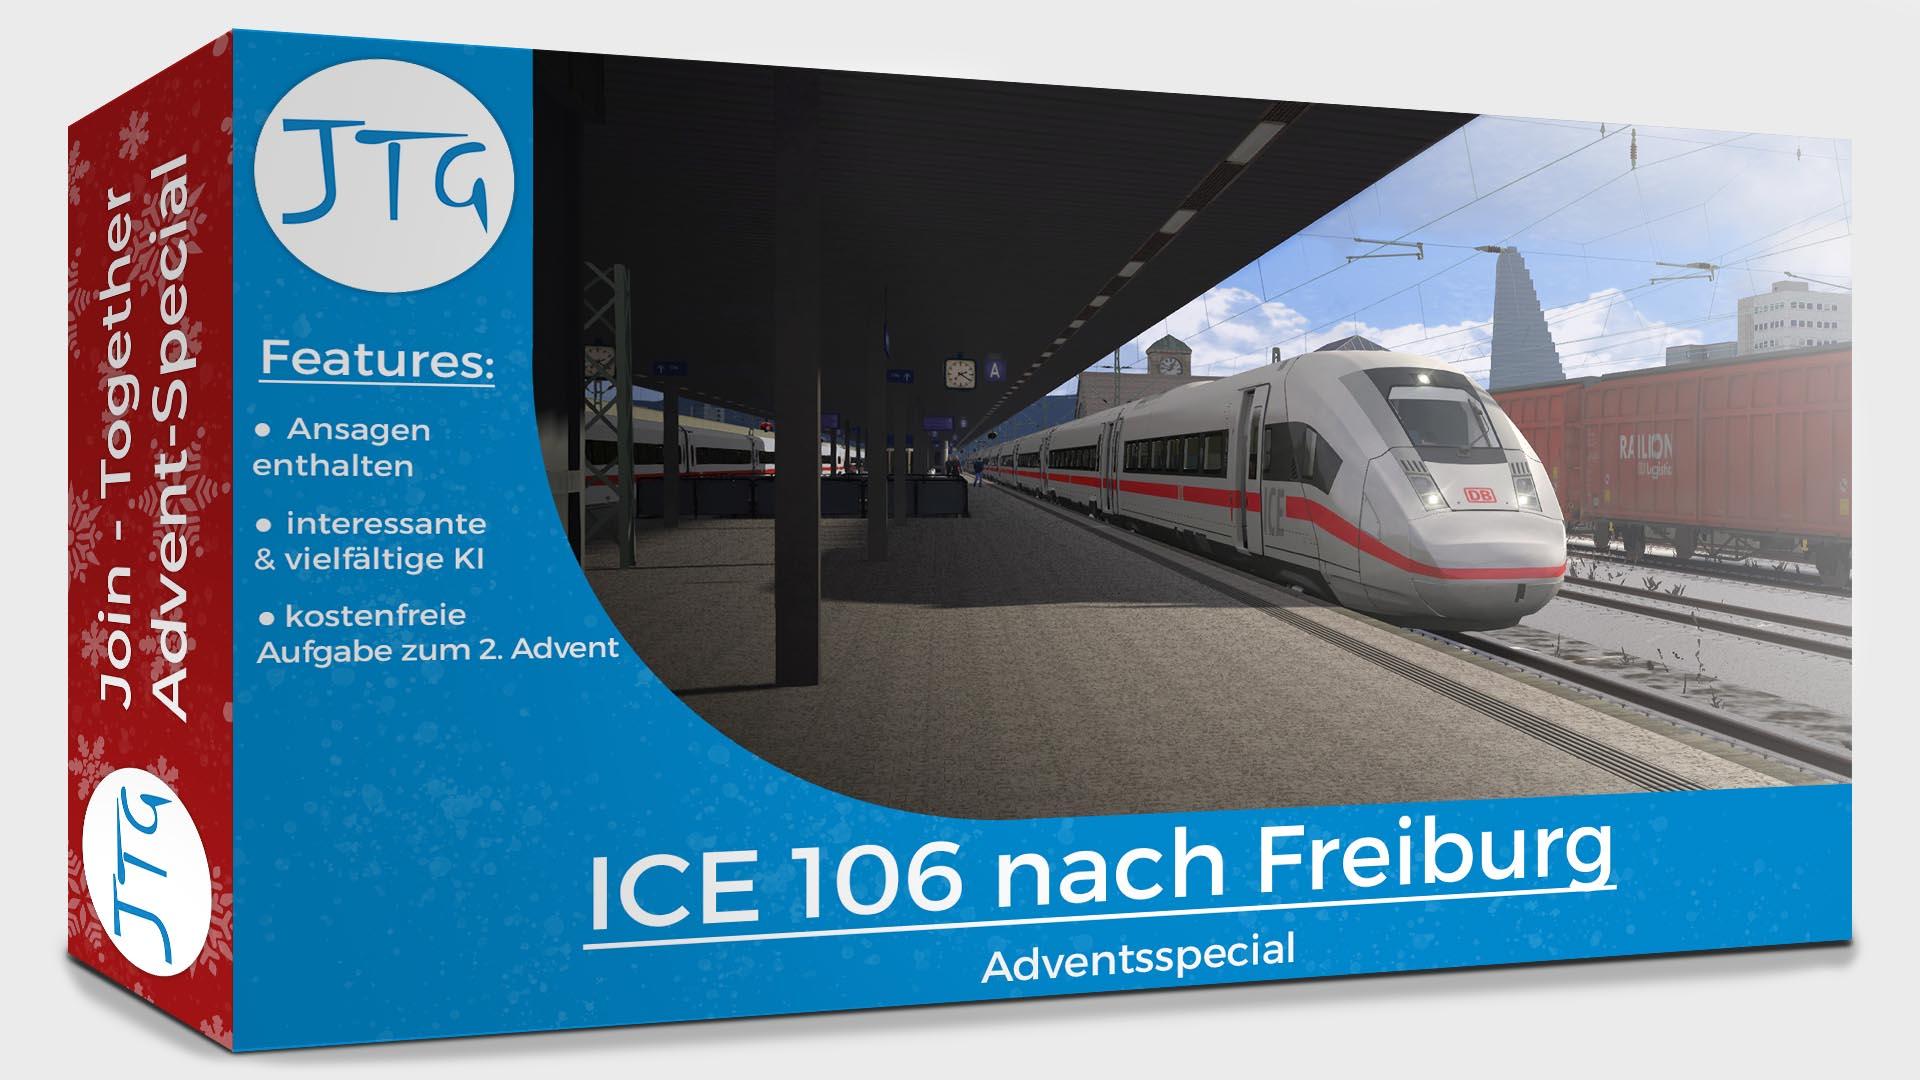 JTG - ICE 106 to Freiburg - Free scenario for the 2. Advent